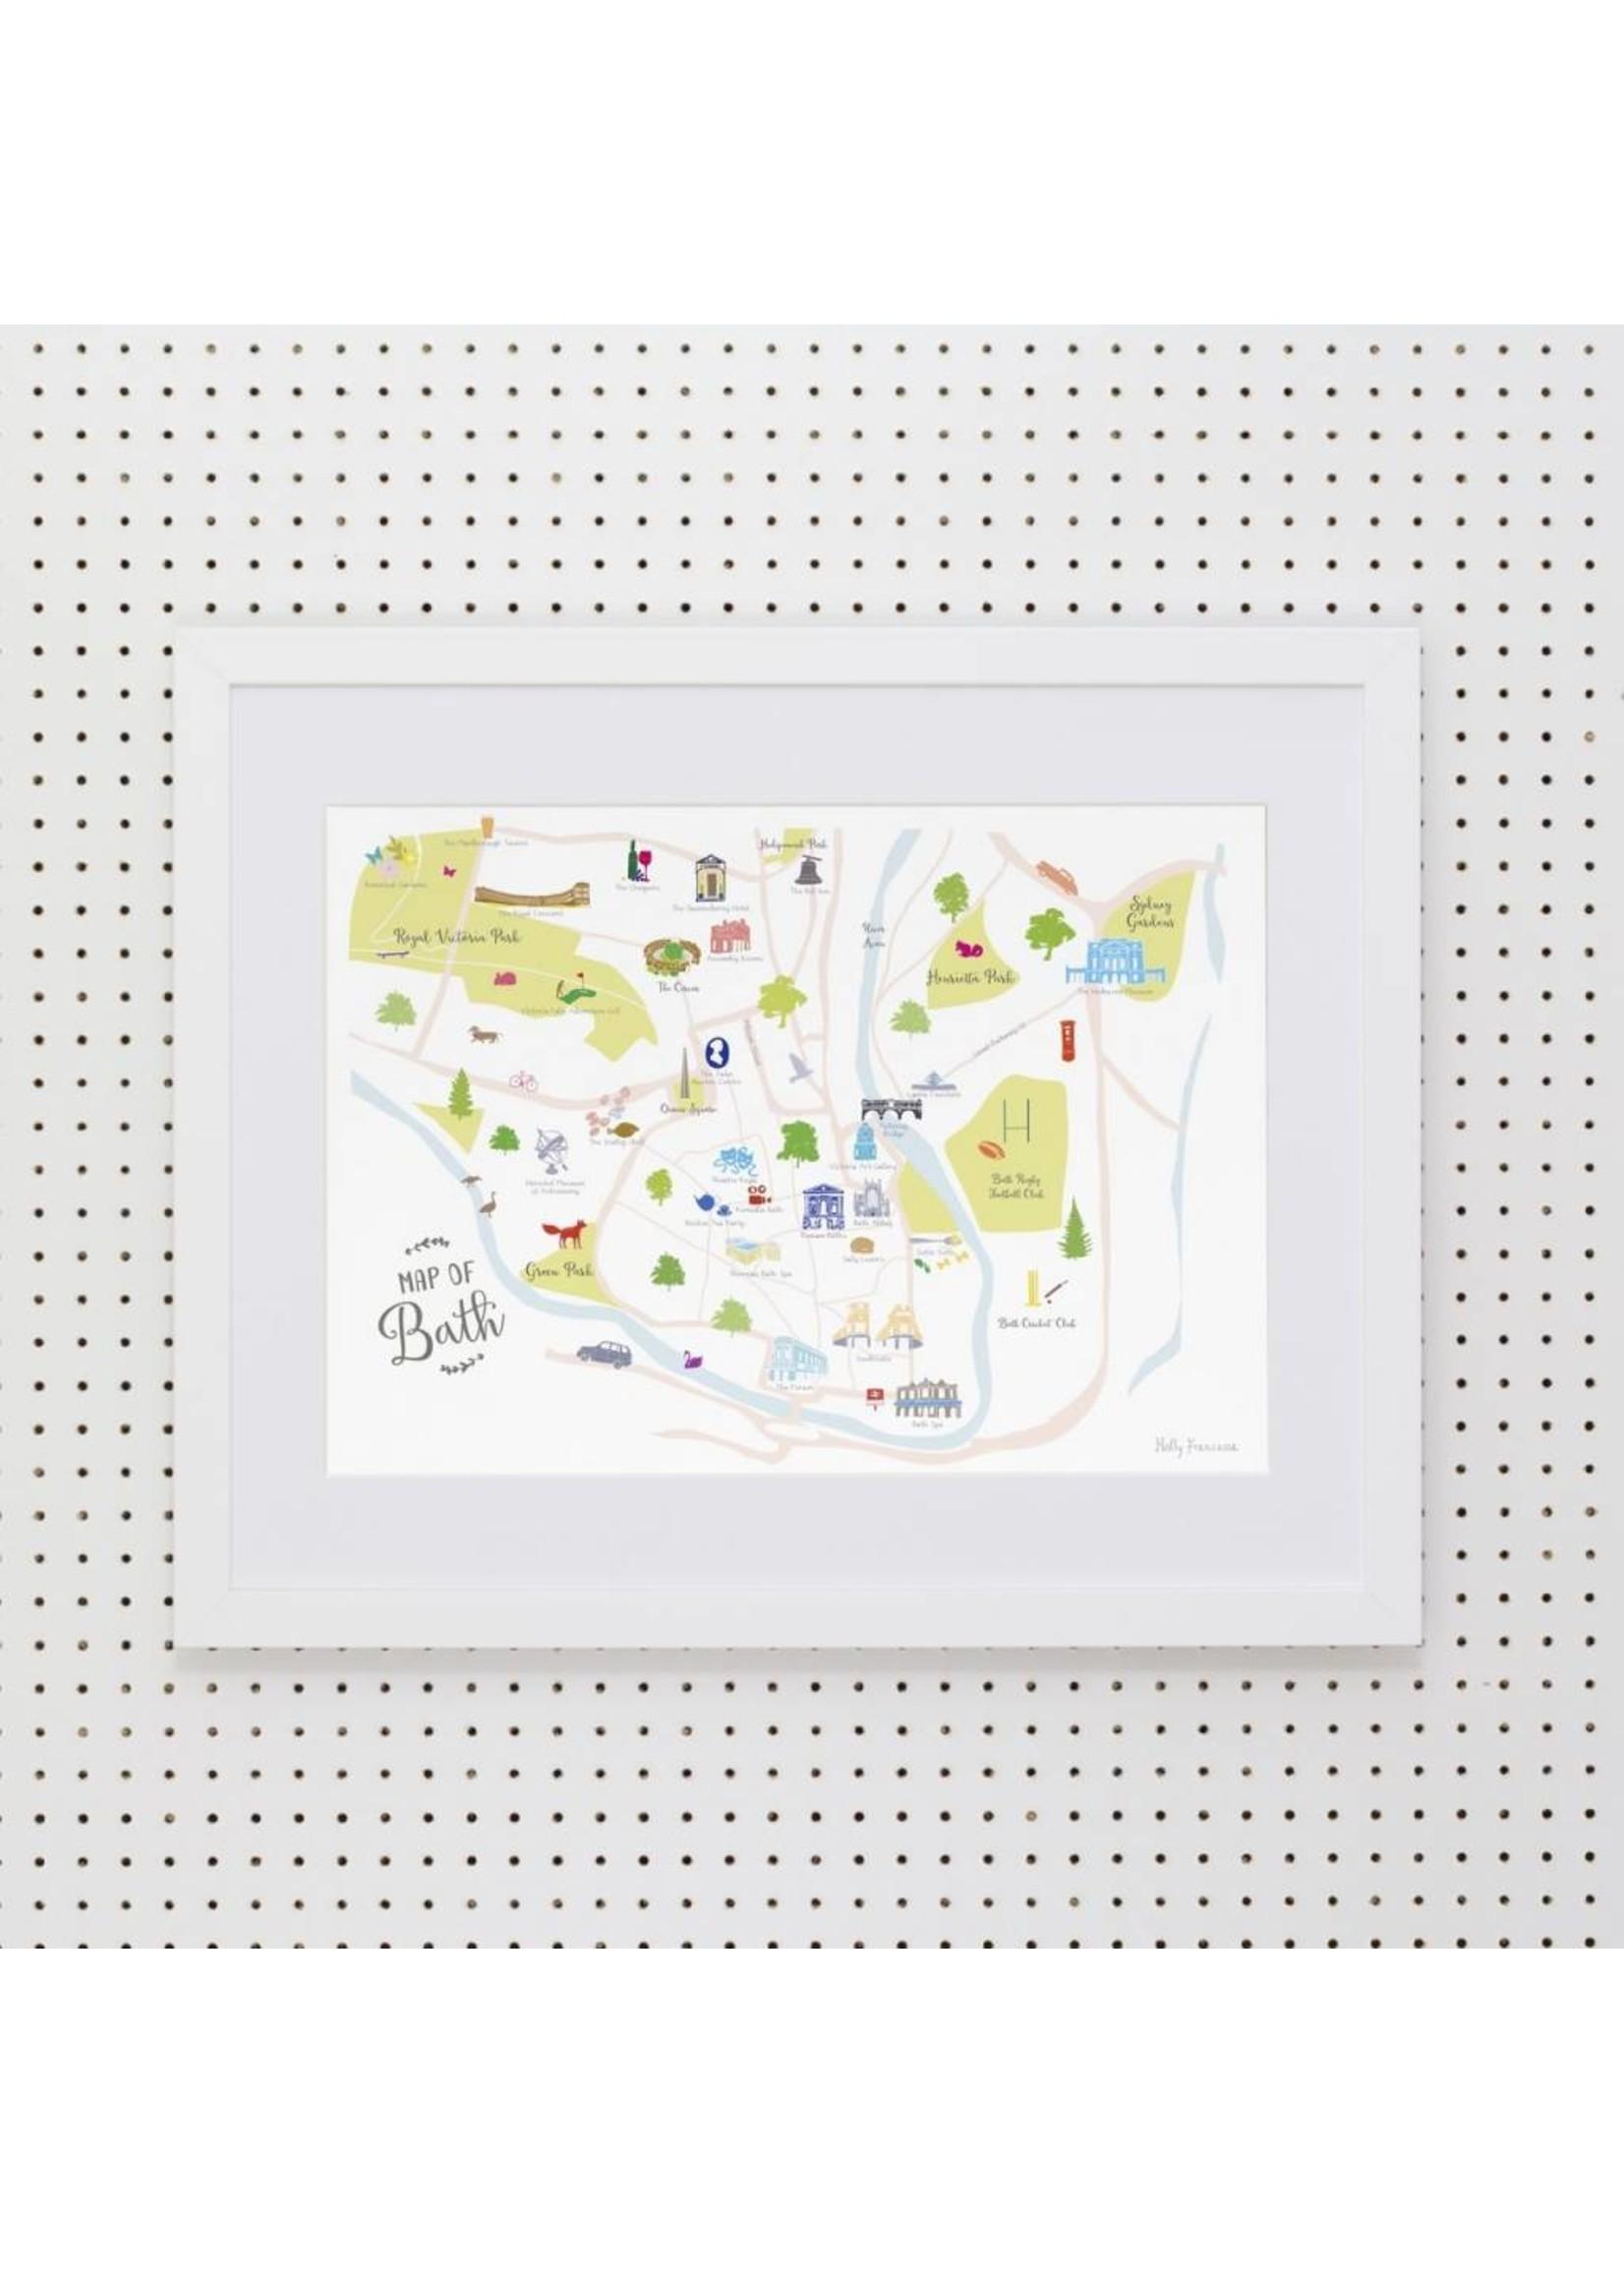 Holly Francesca Holly Francesca Map of Bath - A3